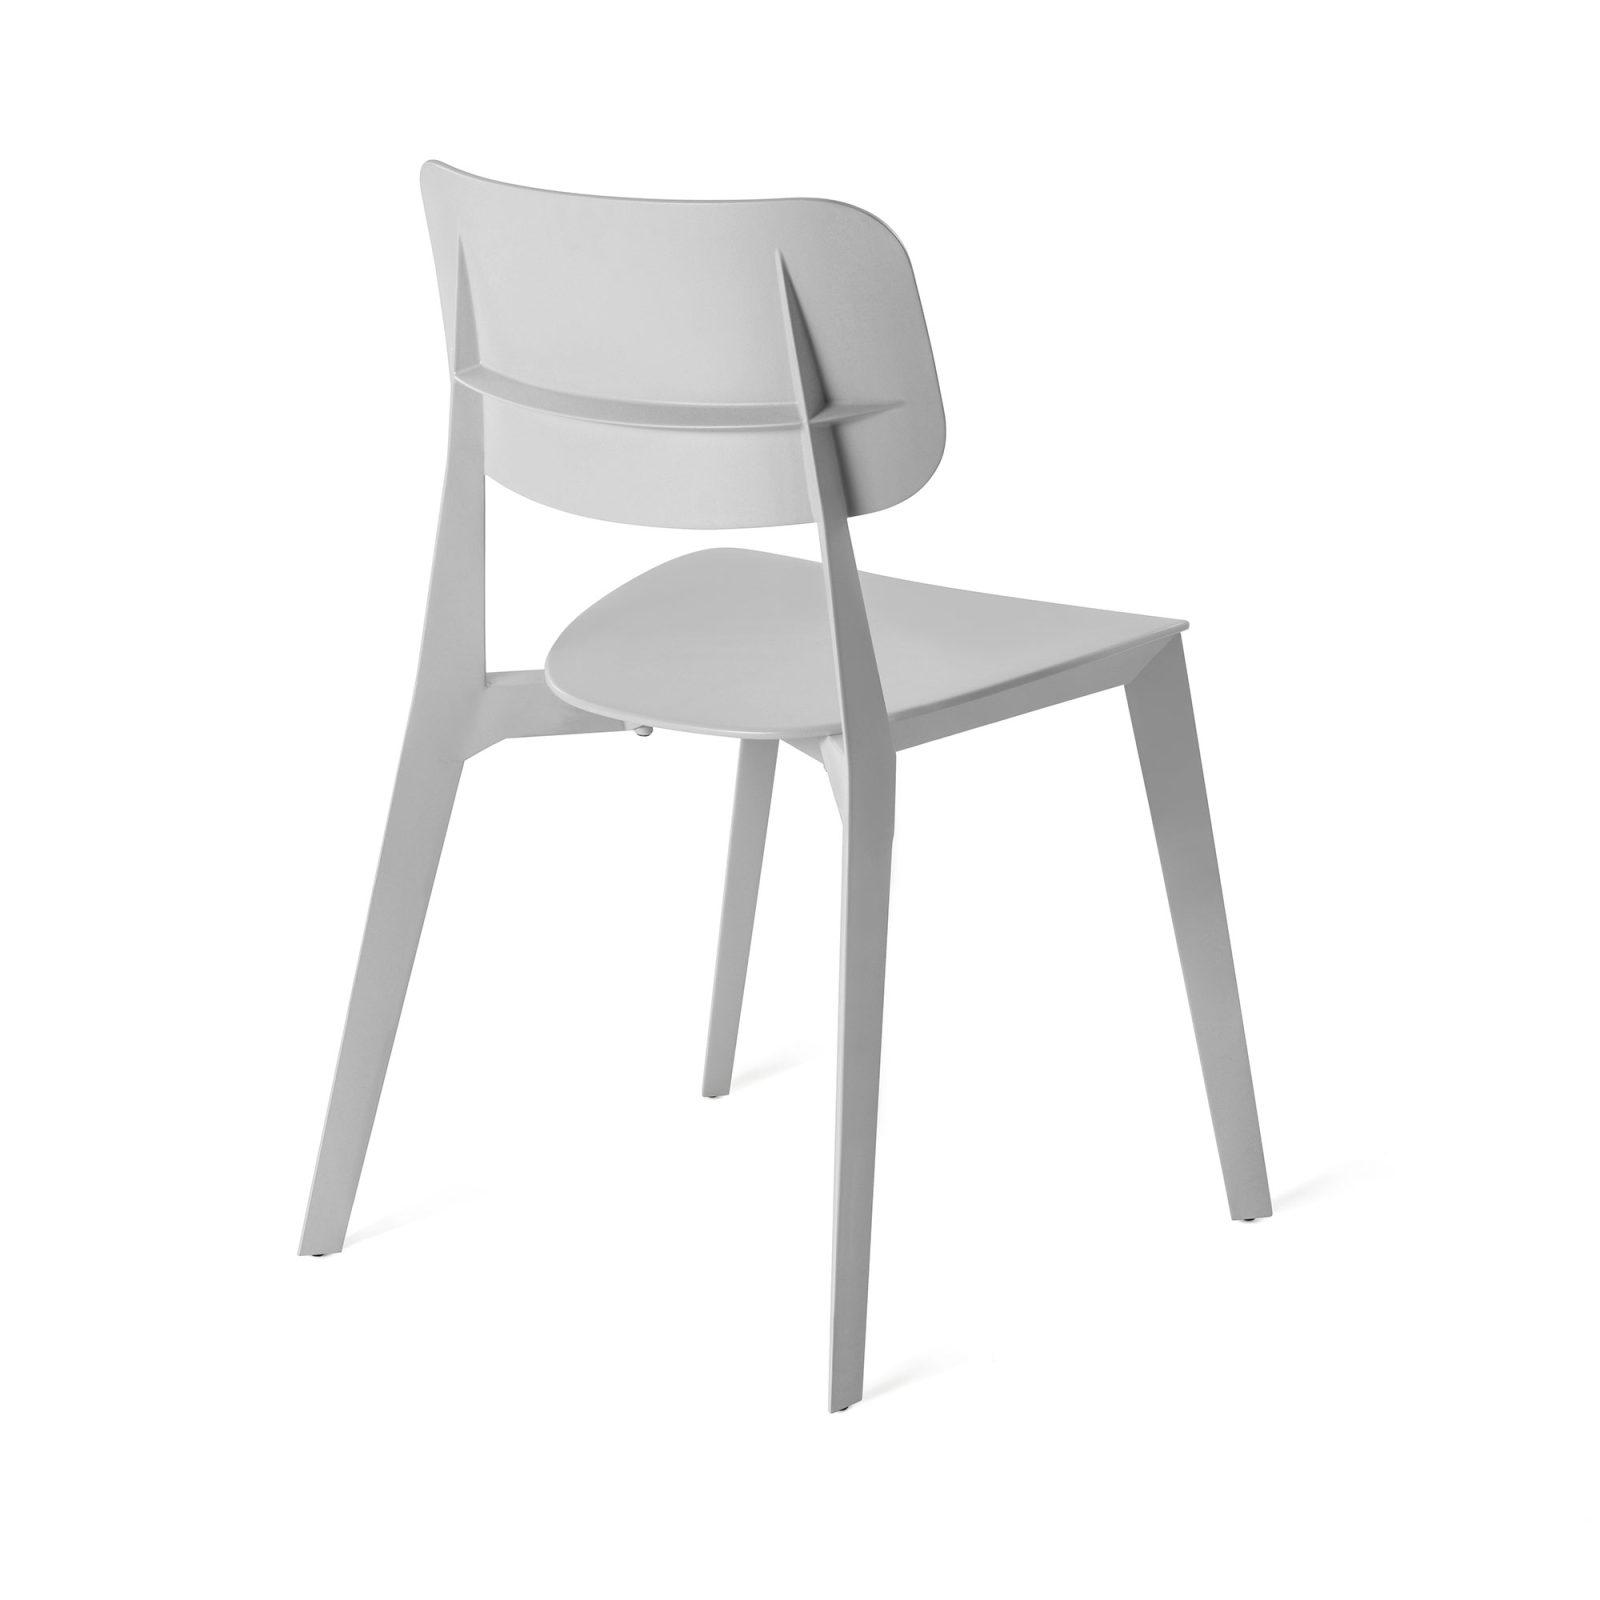 stellar-chair-light-grey-3